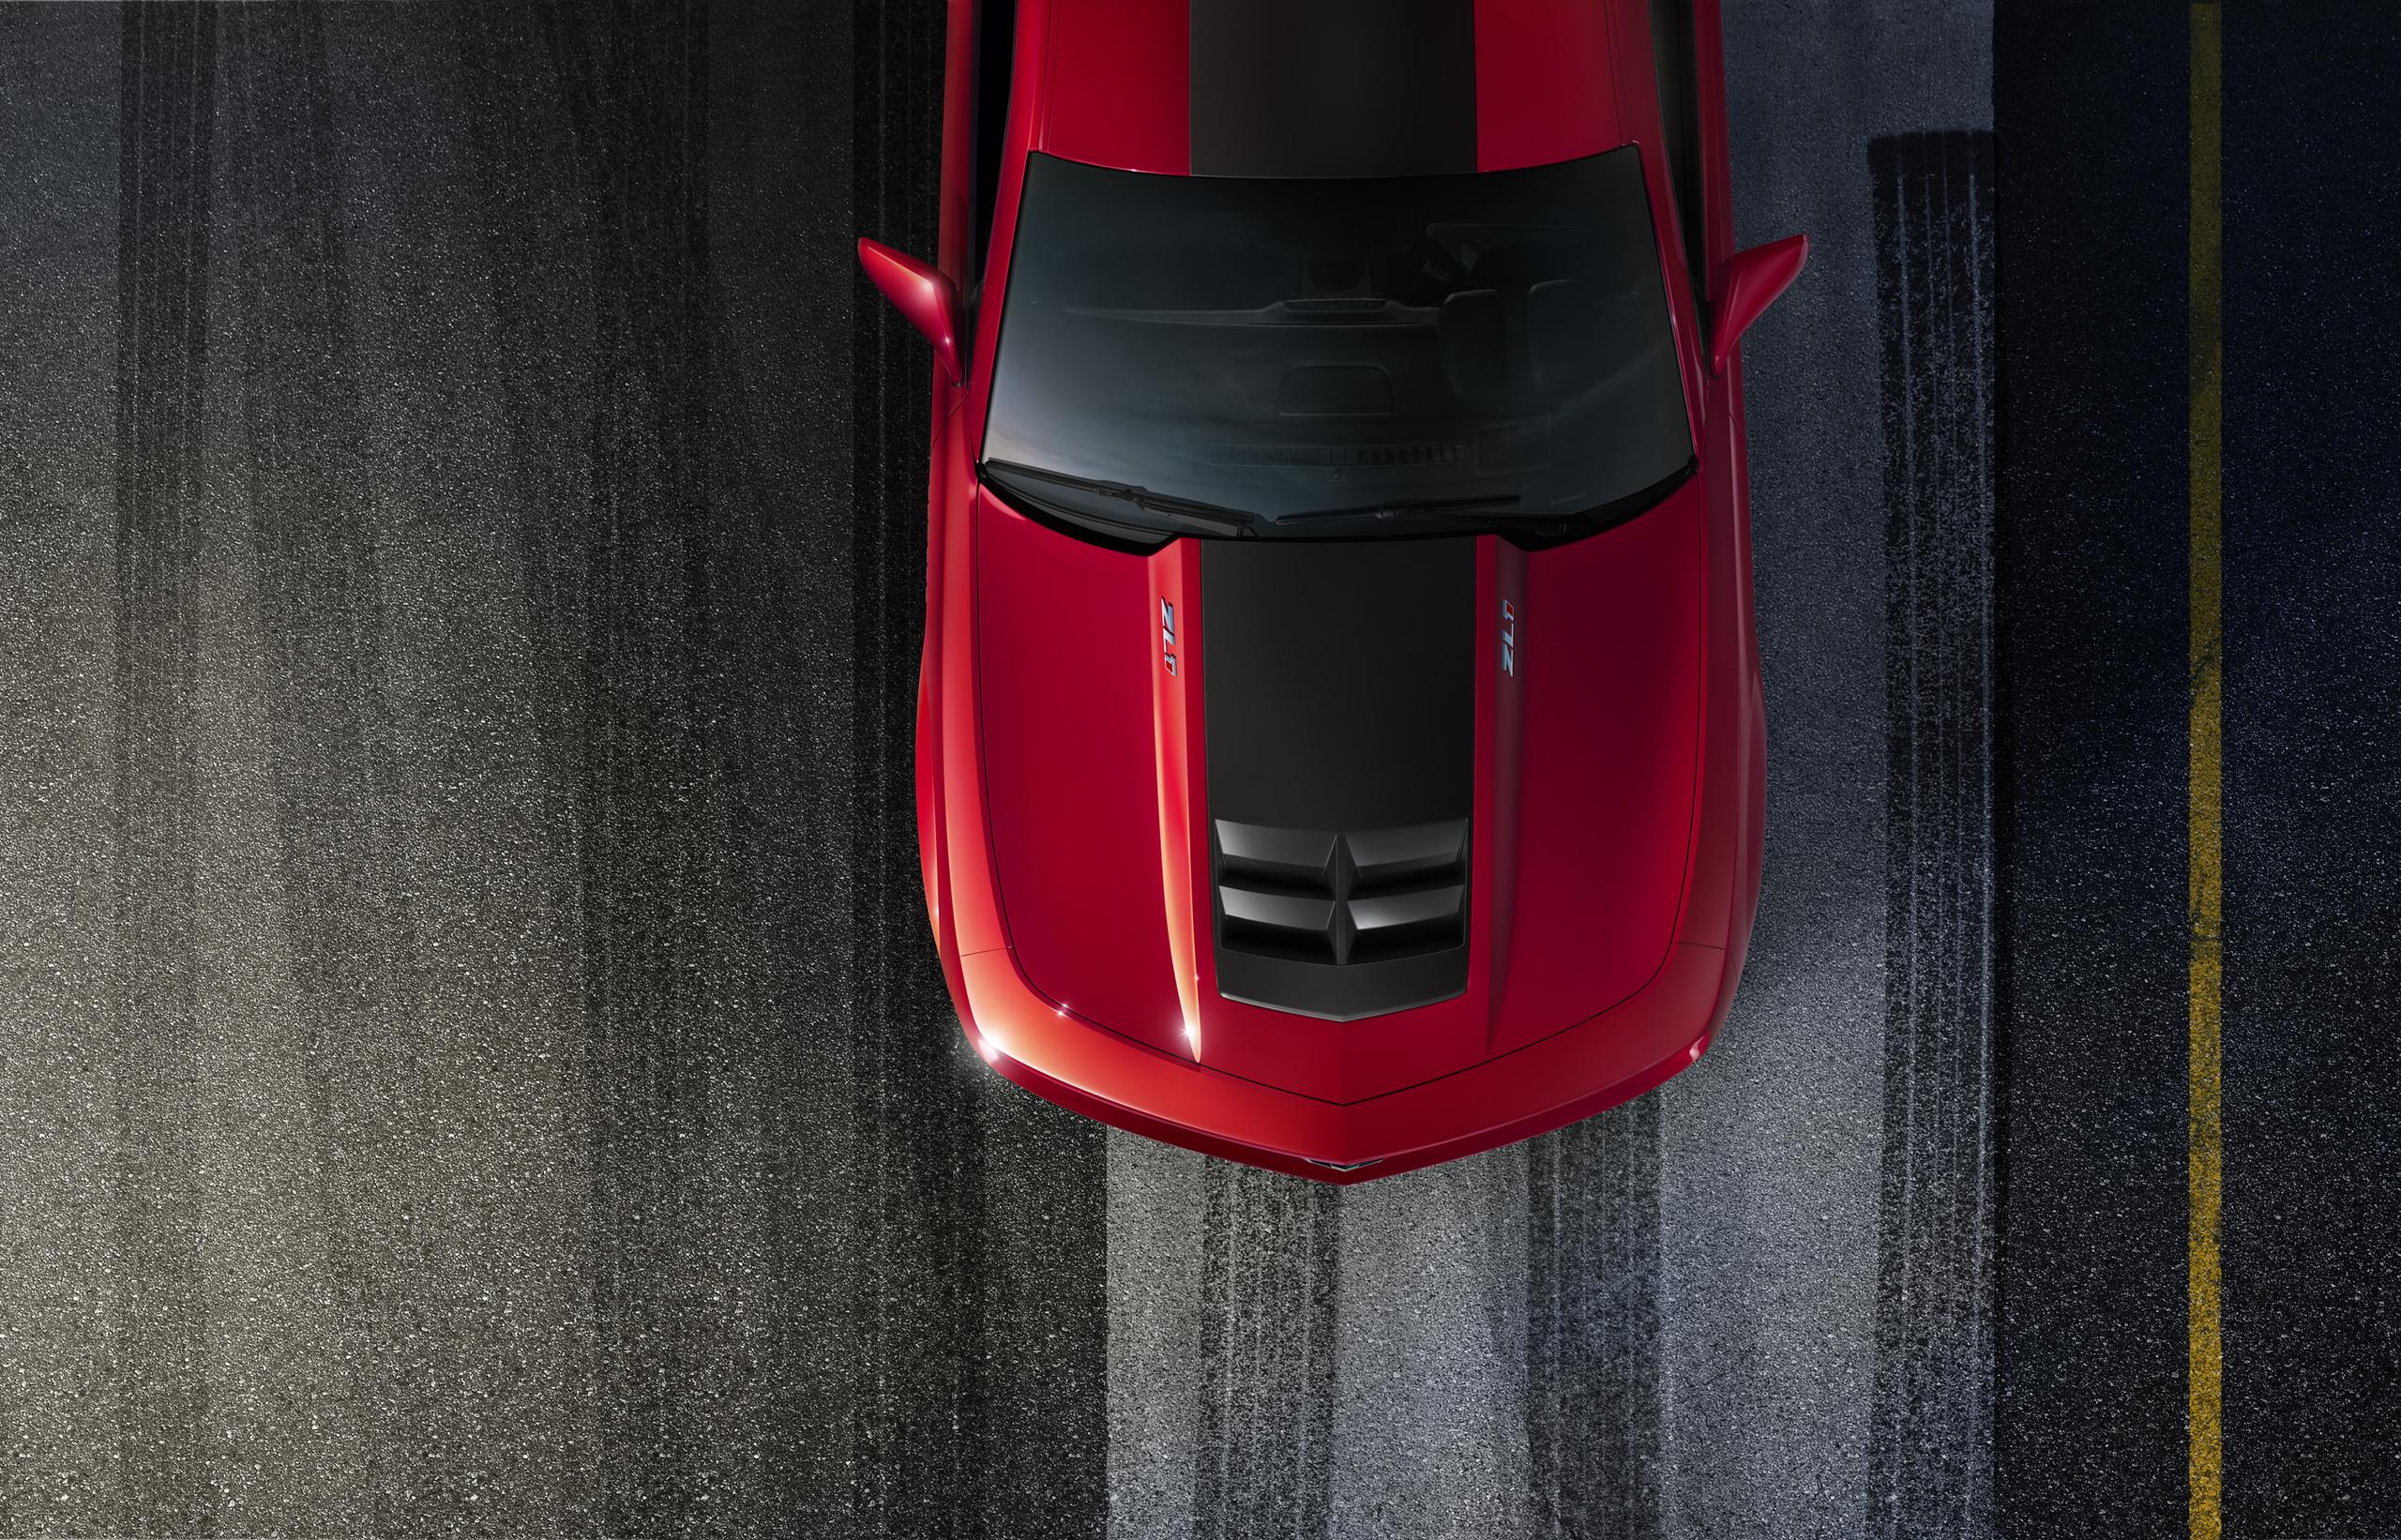 Hot New Movies Cars Images 2012 Camaro Zl1 Hd Wallpaper And